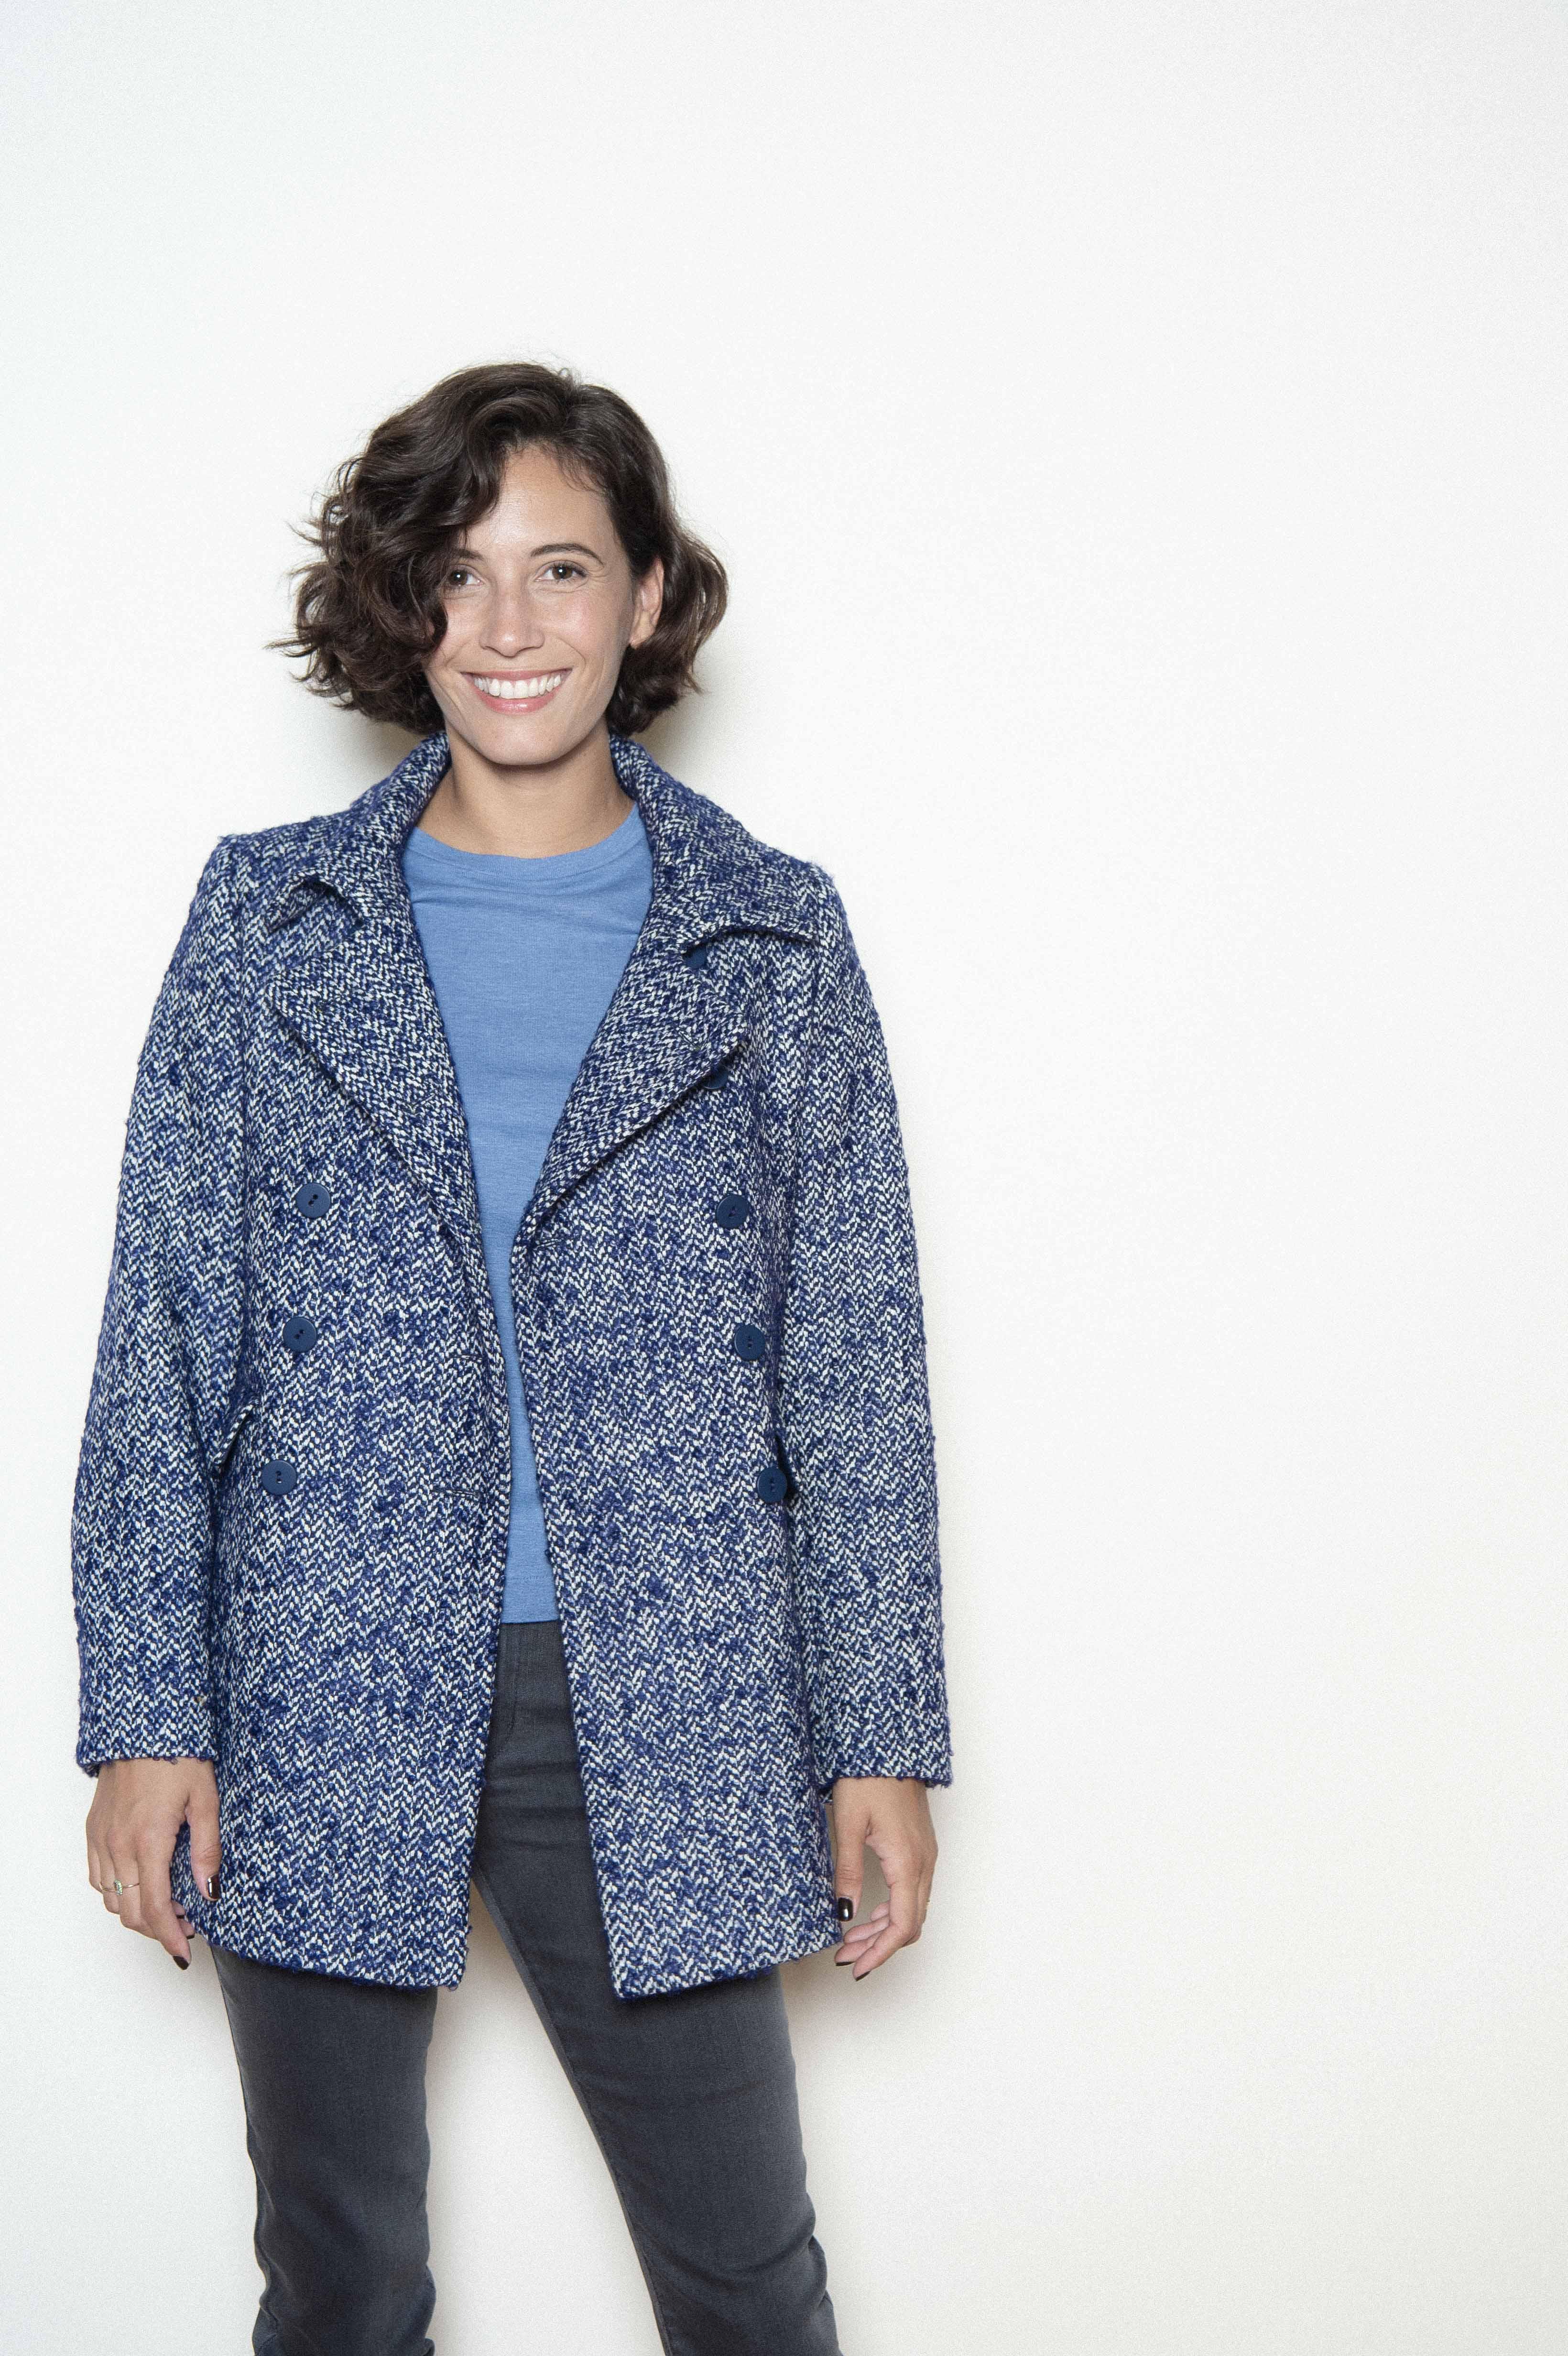 """Chevron"" woolen jacket 62% virgin wool 8% mohair 18% acrylic 12% polyeste"